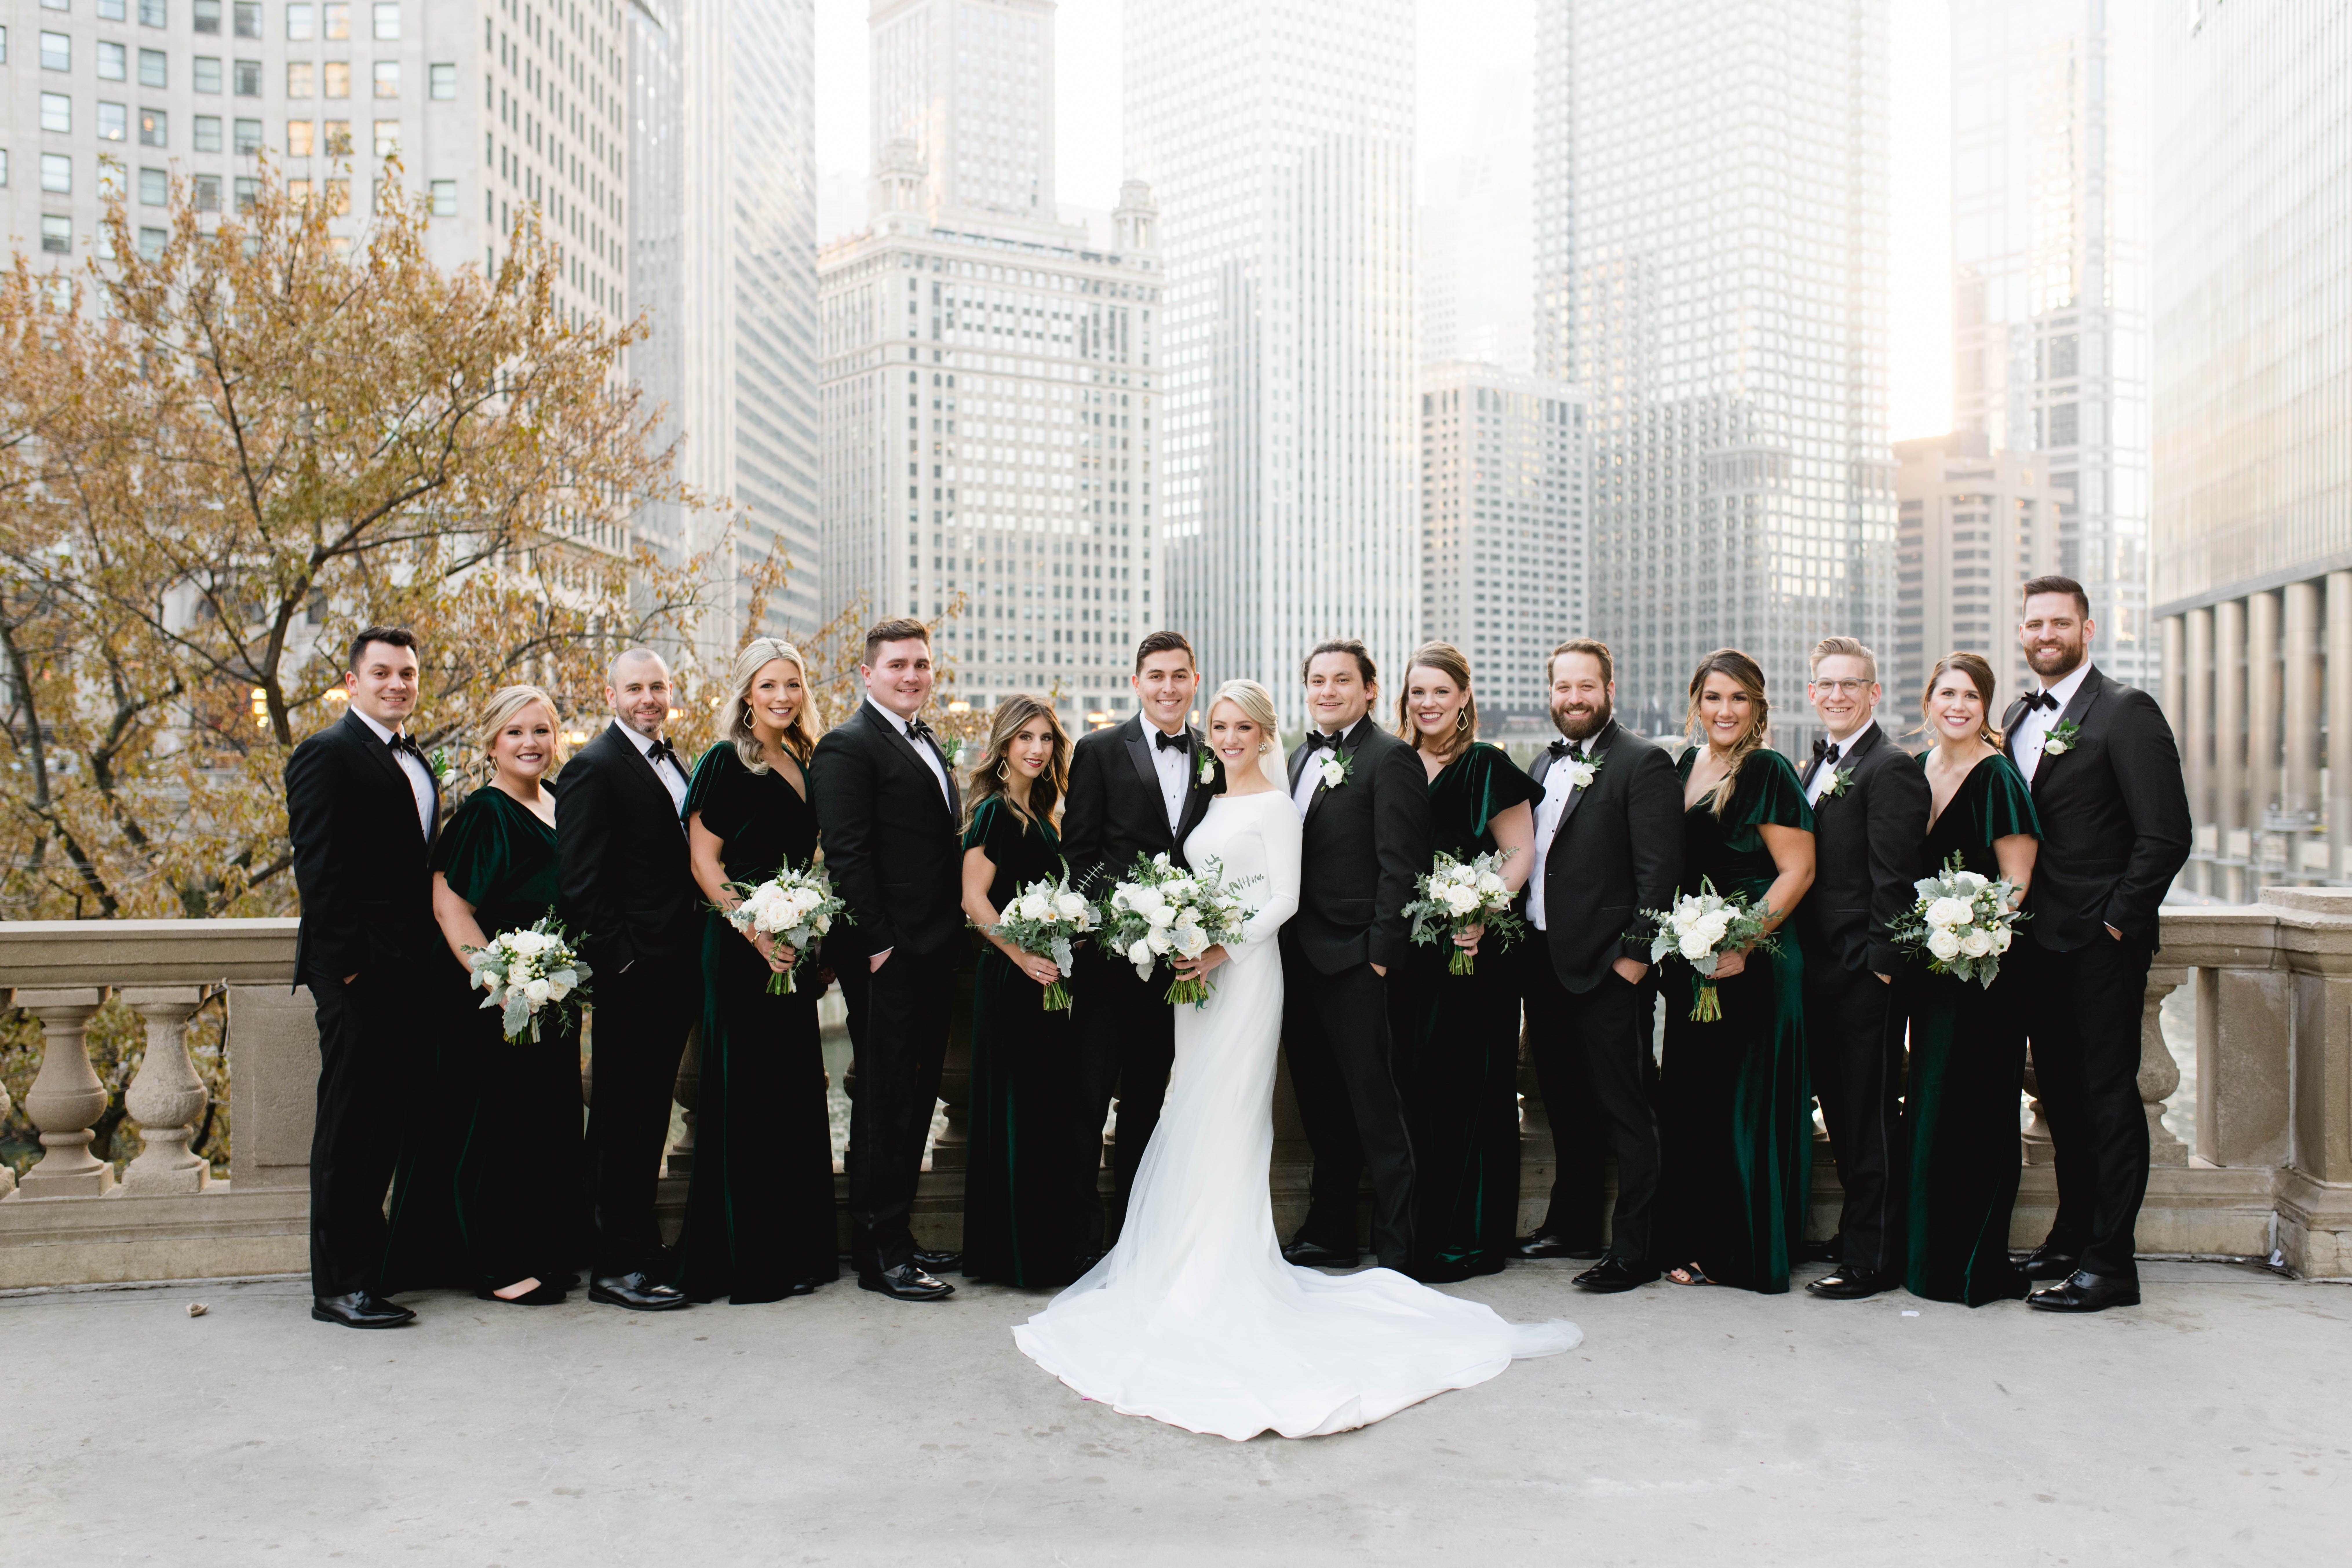 Timeless Downtown Chicago Wedding Chicago Illinois Niki Marie Photography In 2020 Chicago Wedding Wedding Wedding Classic